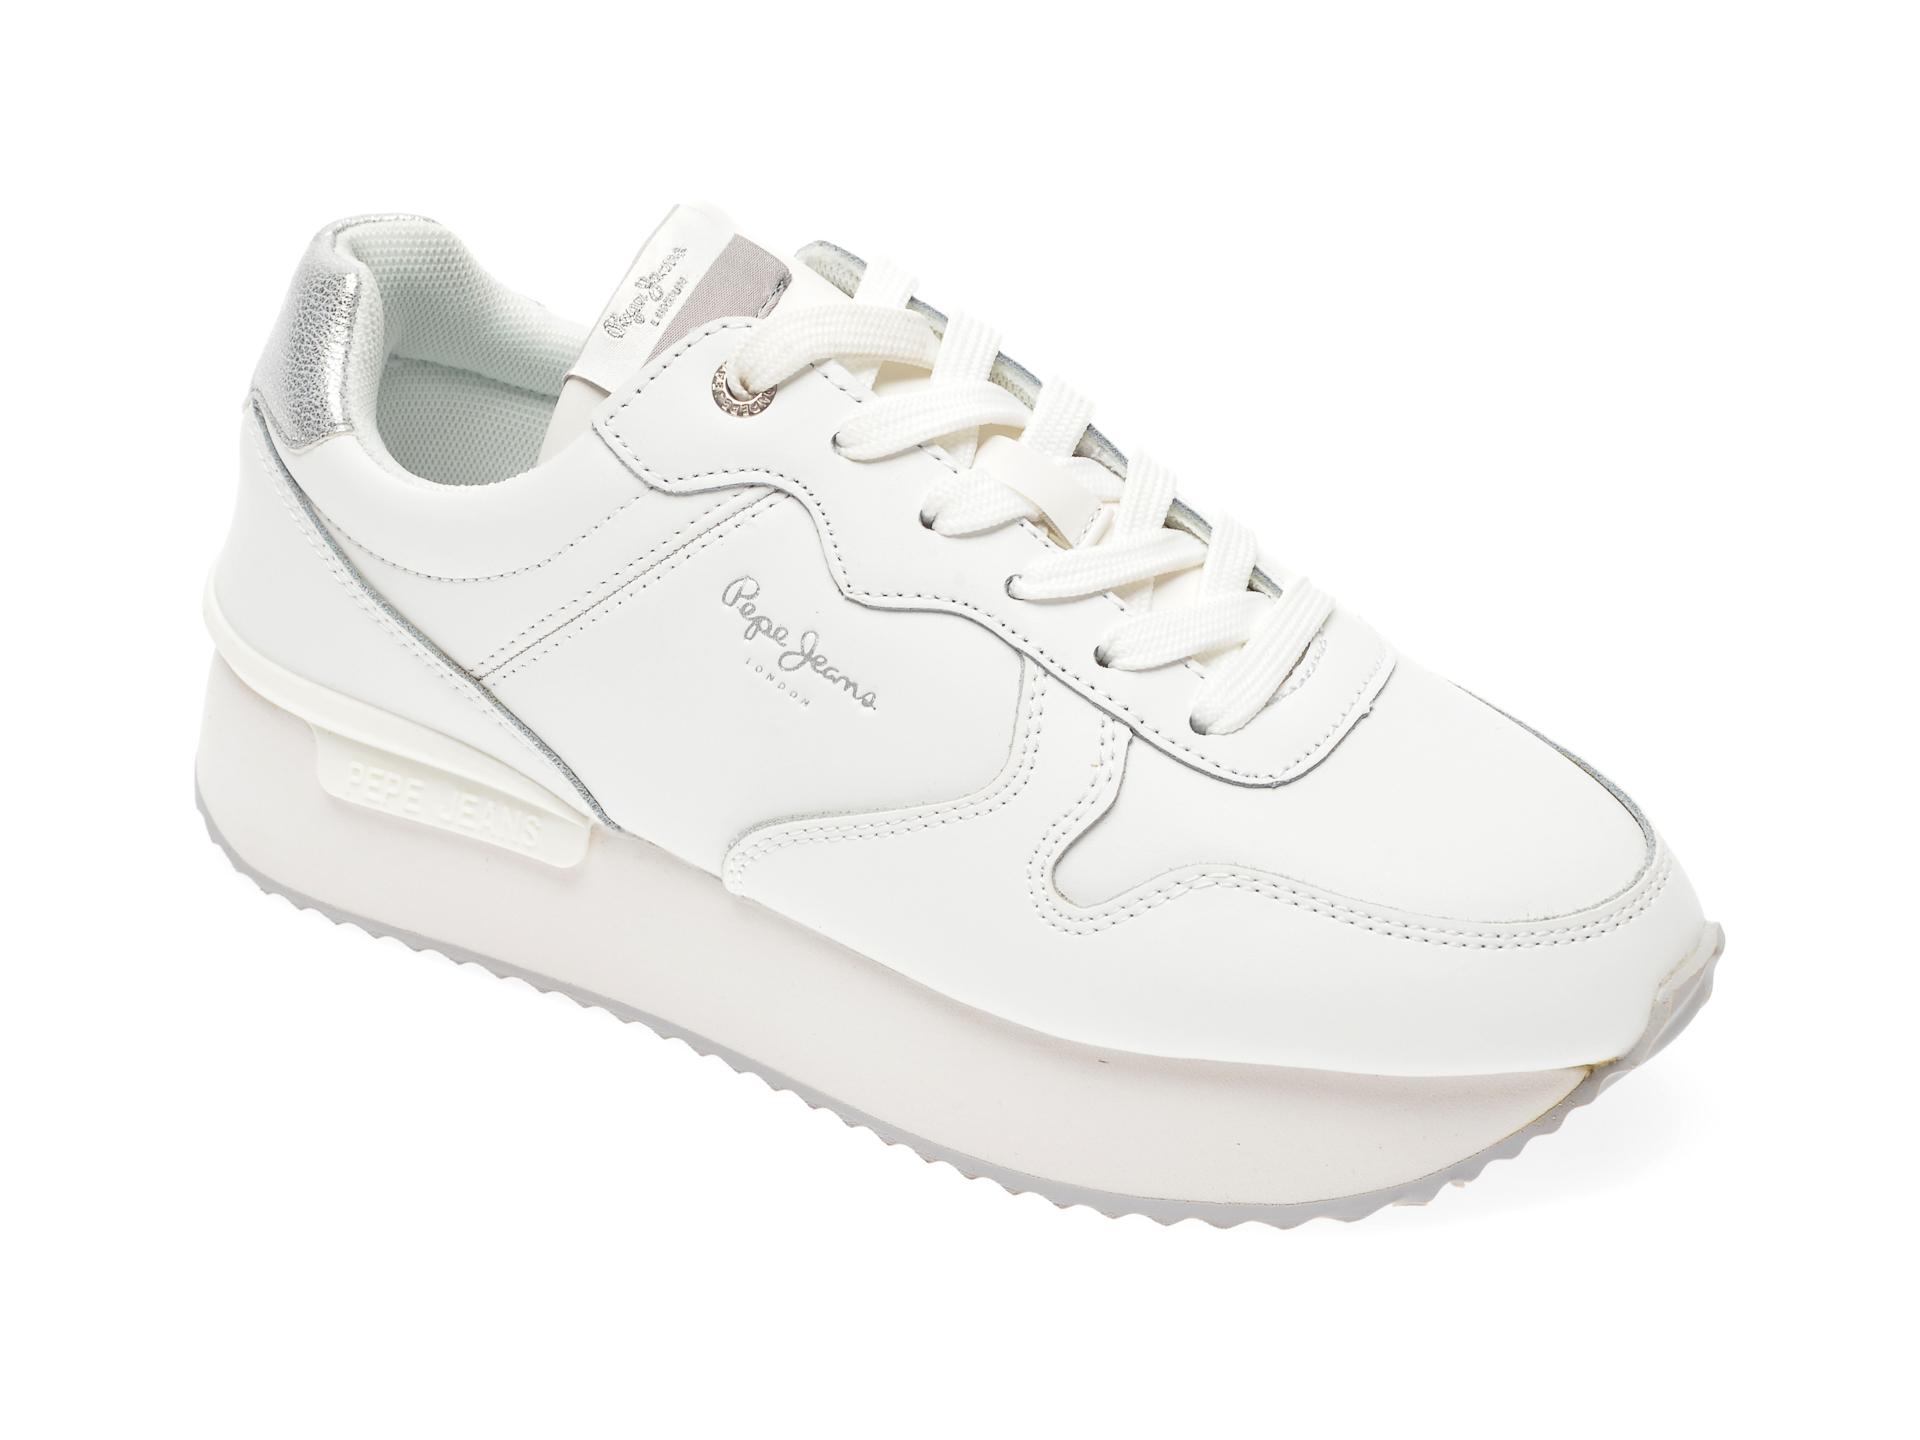 Pantofi sport PEPE JEANS albi, LS30995, din piele naturala imagine